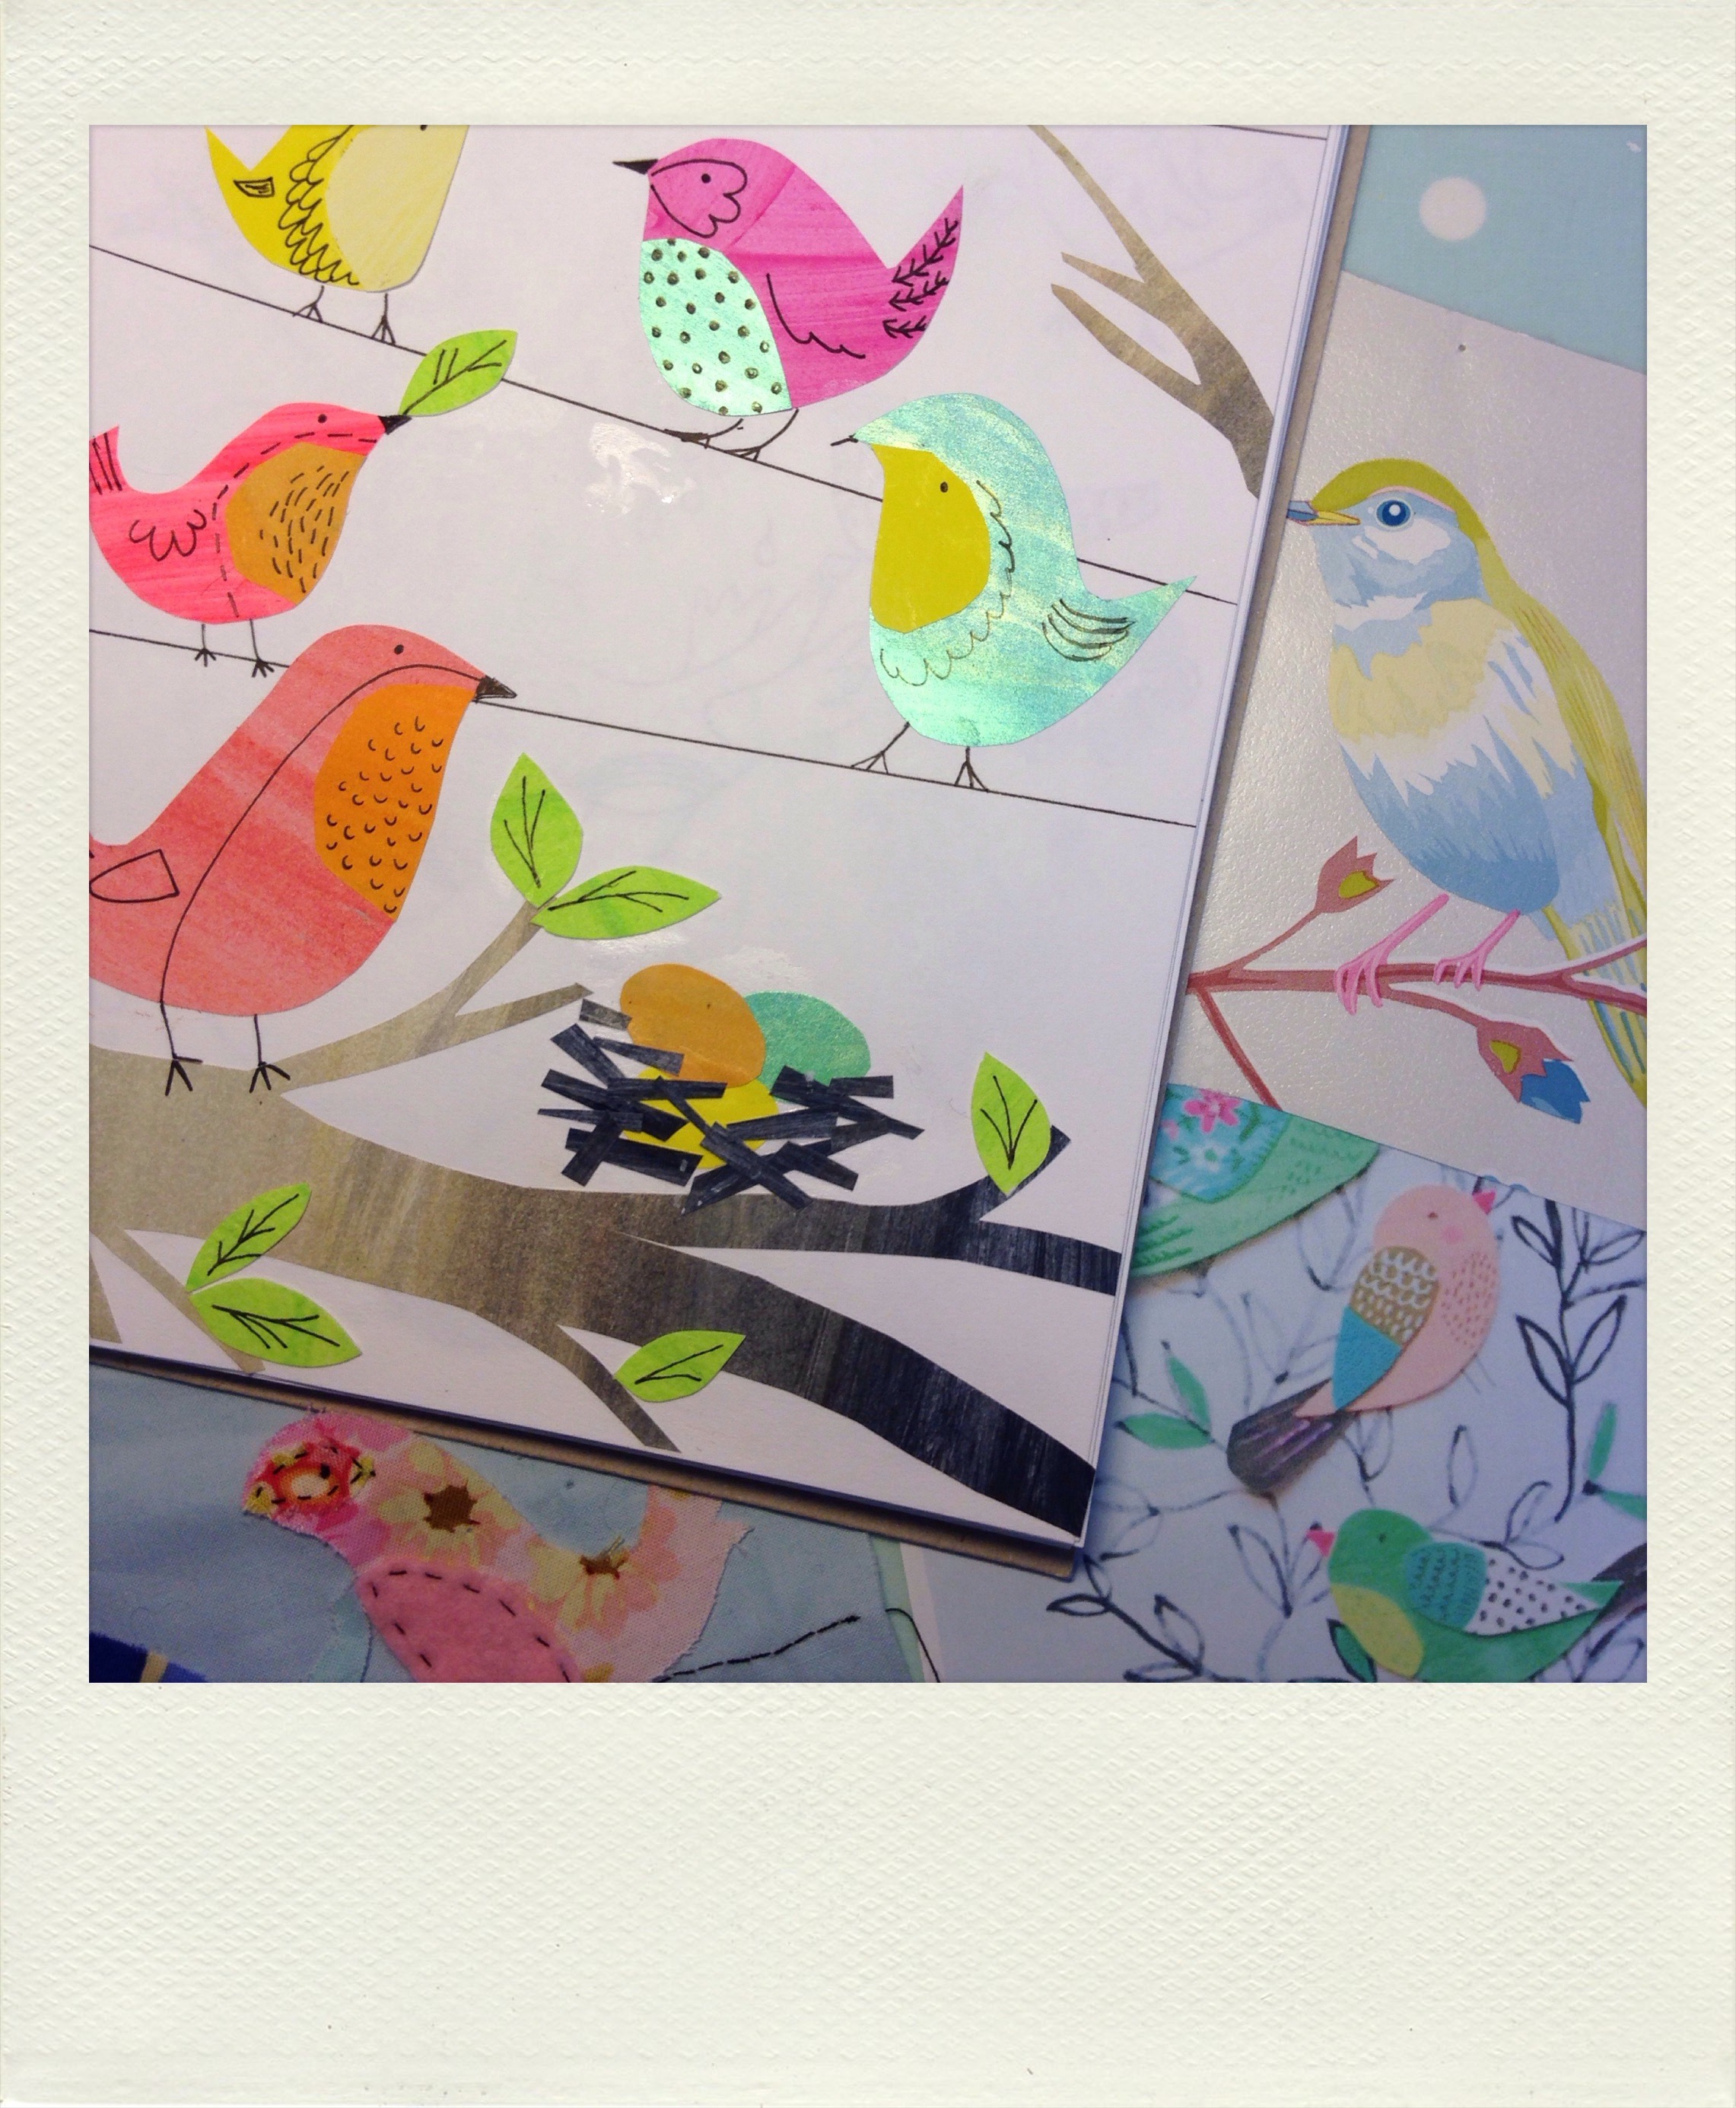 claire_leggett_bird_collage